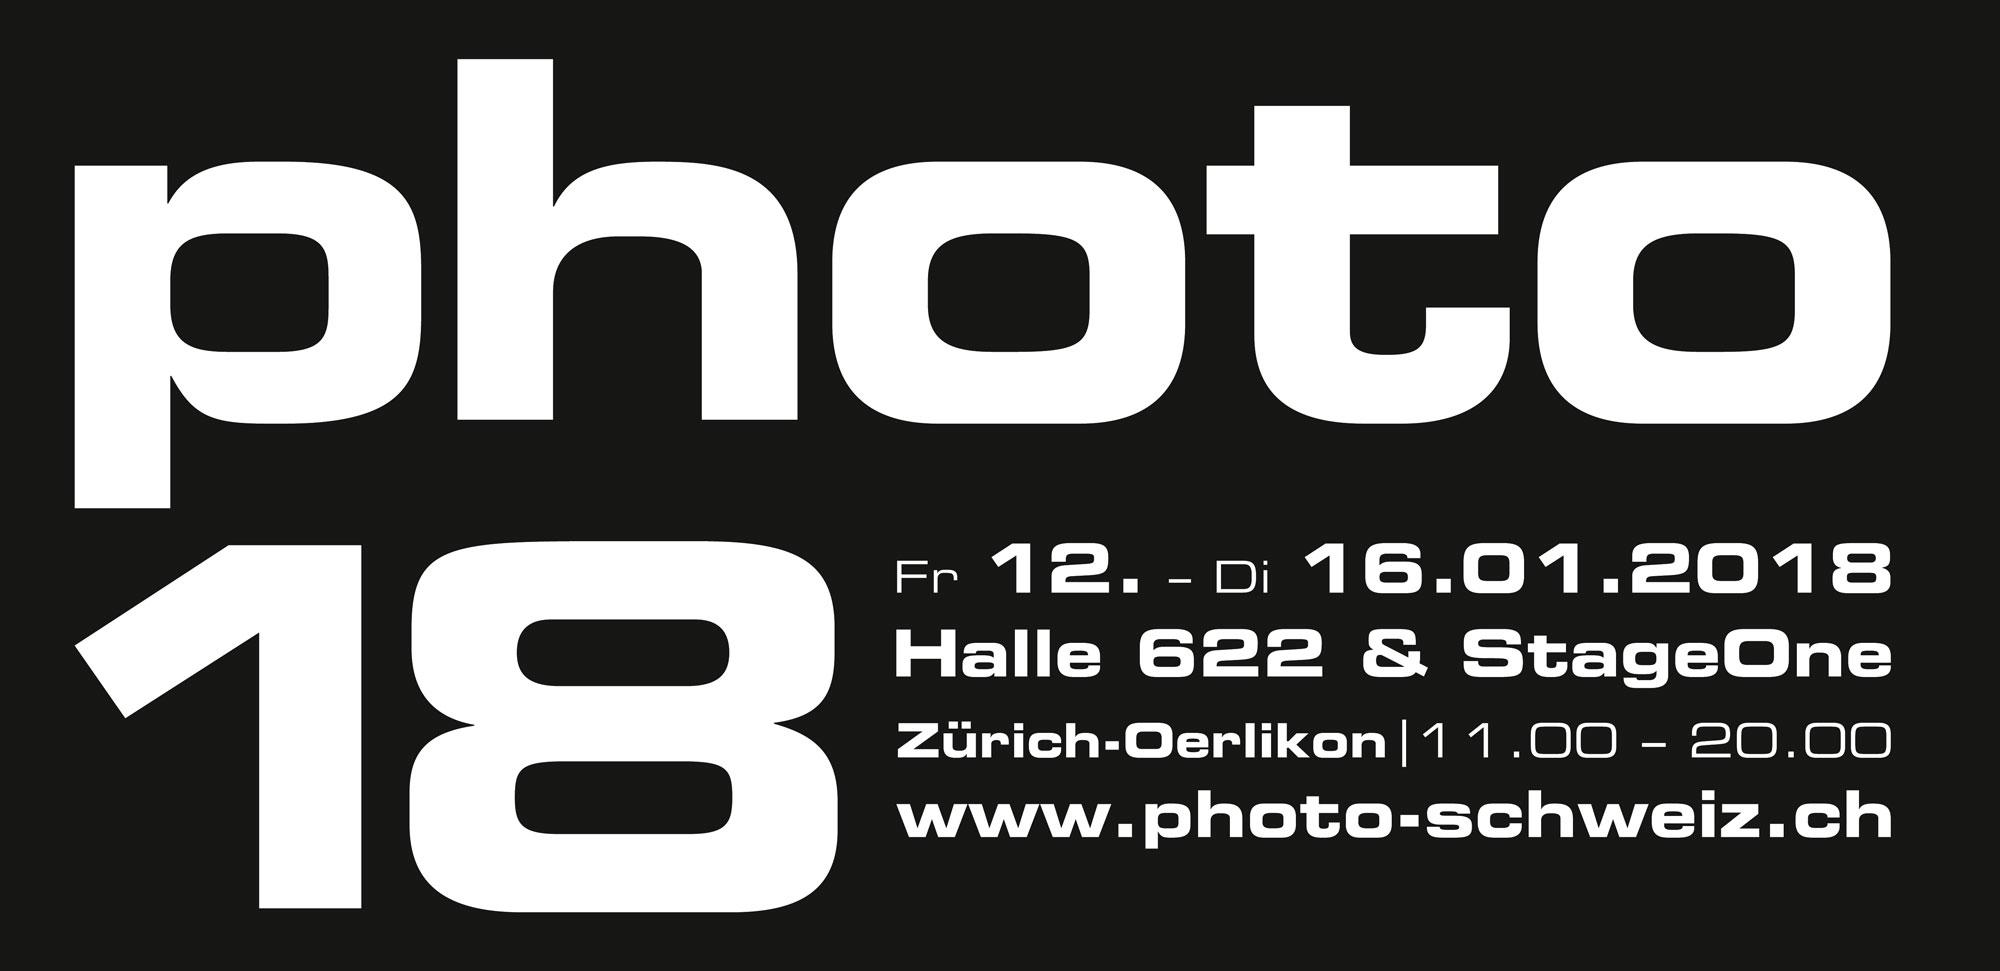 photo 18  Fr 12. - Di 16.01.2018 Halle 622 & StageOne Zürich-örlikon | 11.00 - 20.00